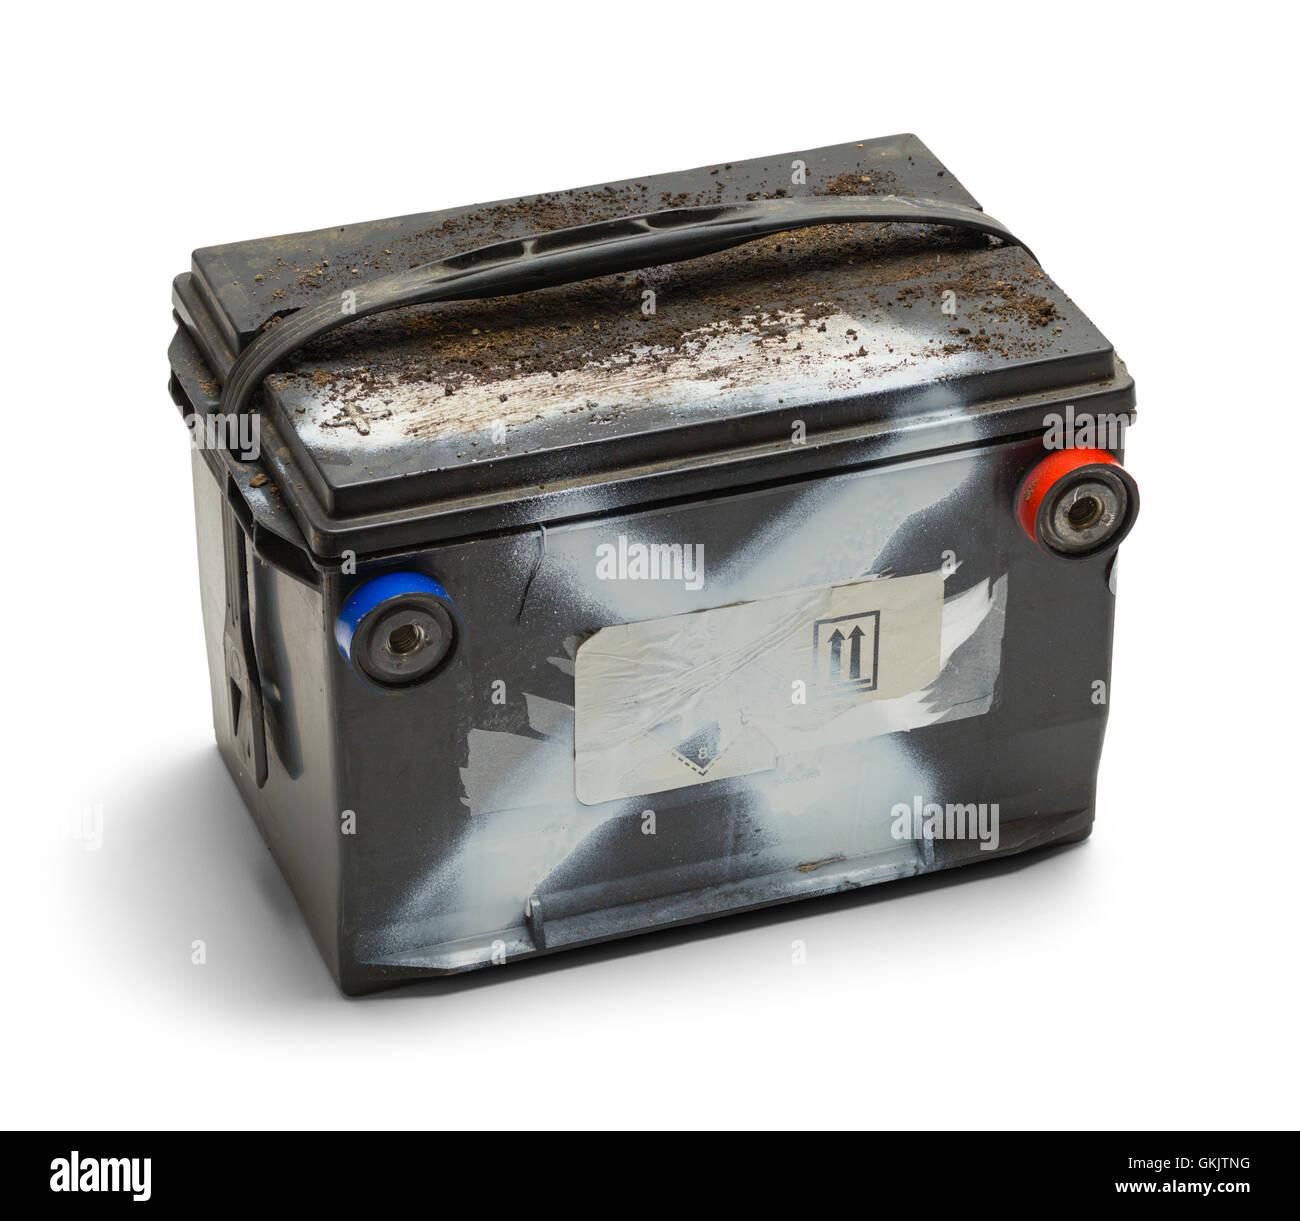 car battery stock photos car battery stock images alamy. Black Bedroom Furniture Sets. Home Design Ideas